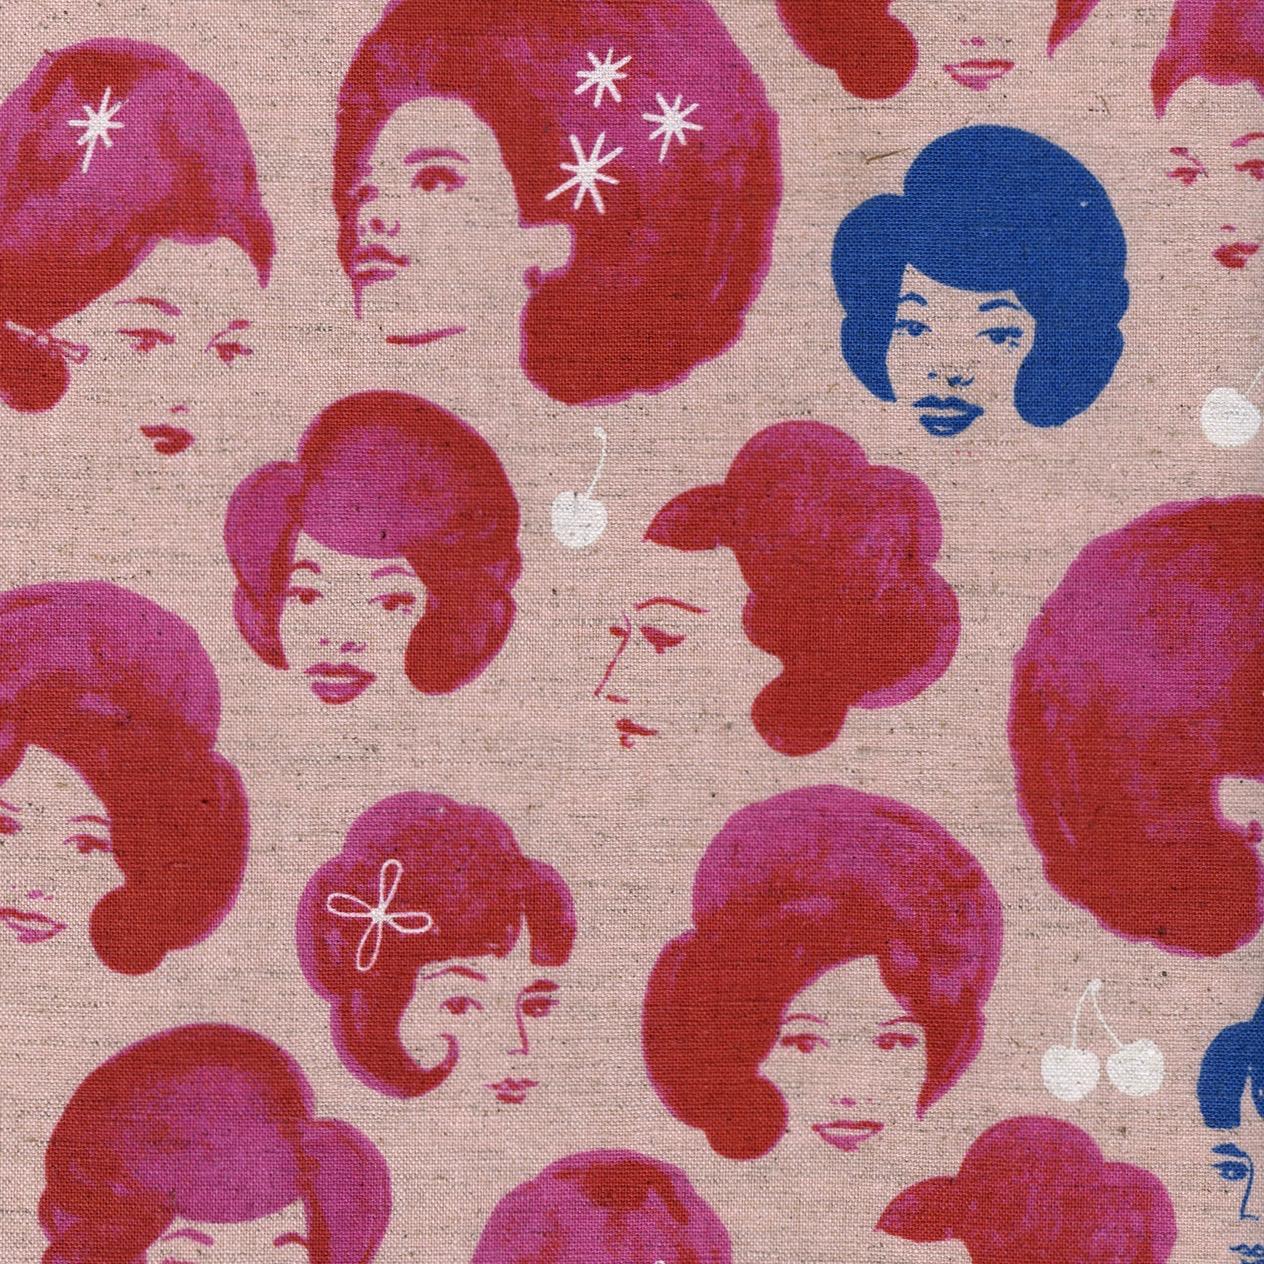 Melody Miller Fruit Dots - Dottie's Friend (Pink)